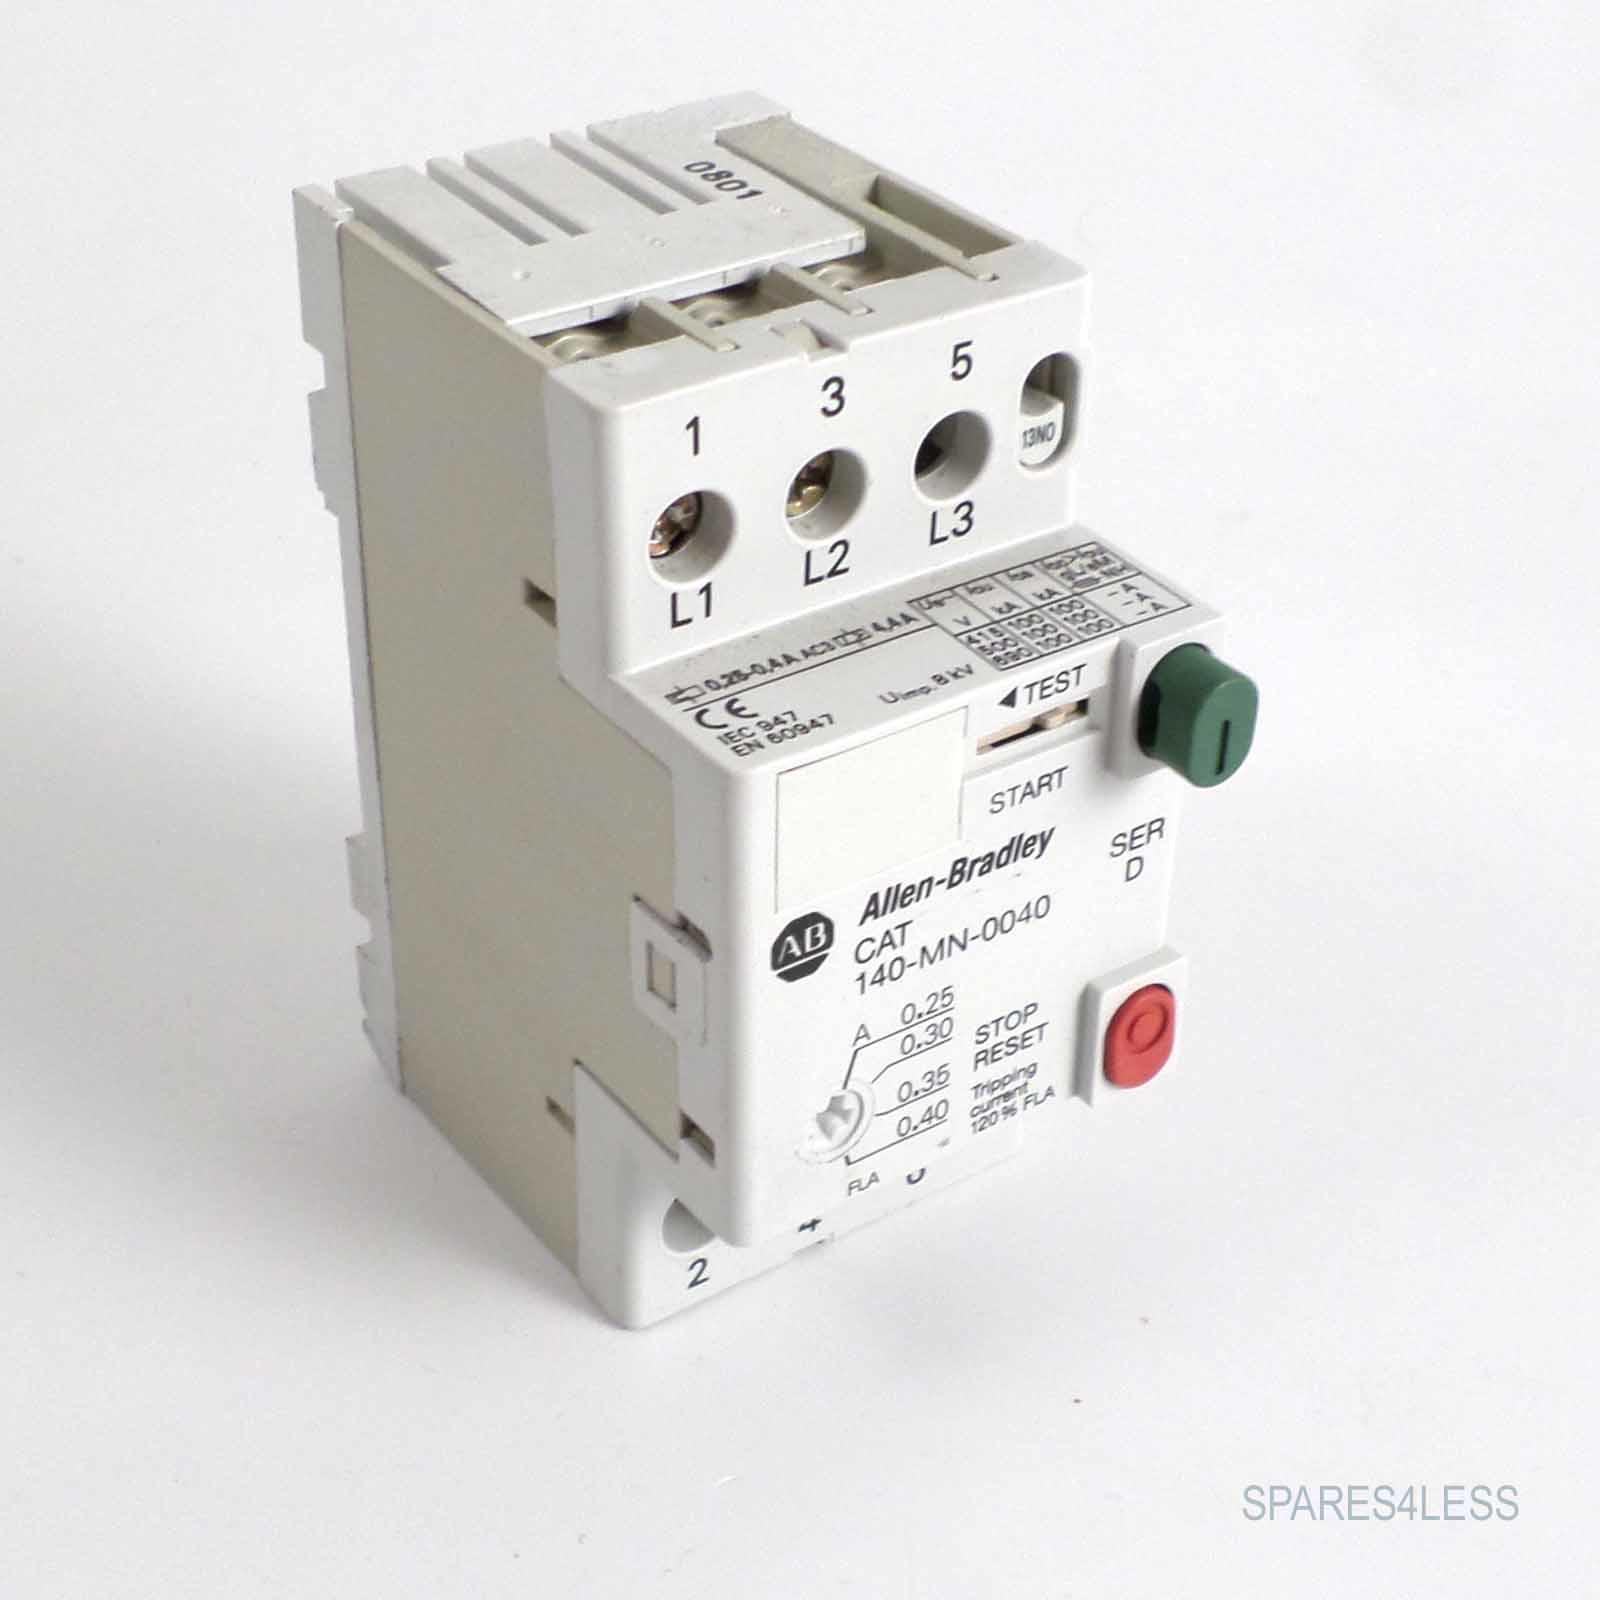 Allen Bradley Manual Motor Starter 140 Mn 0040 Ser D Geb